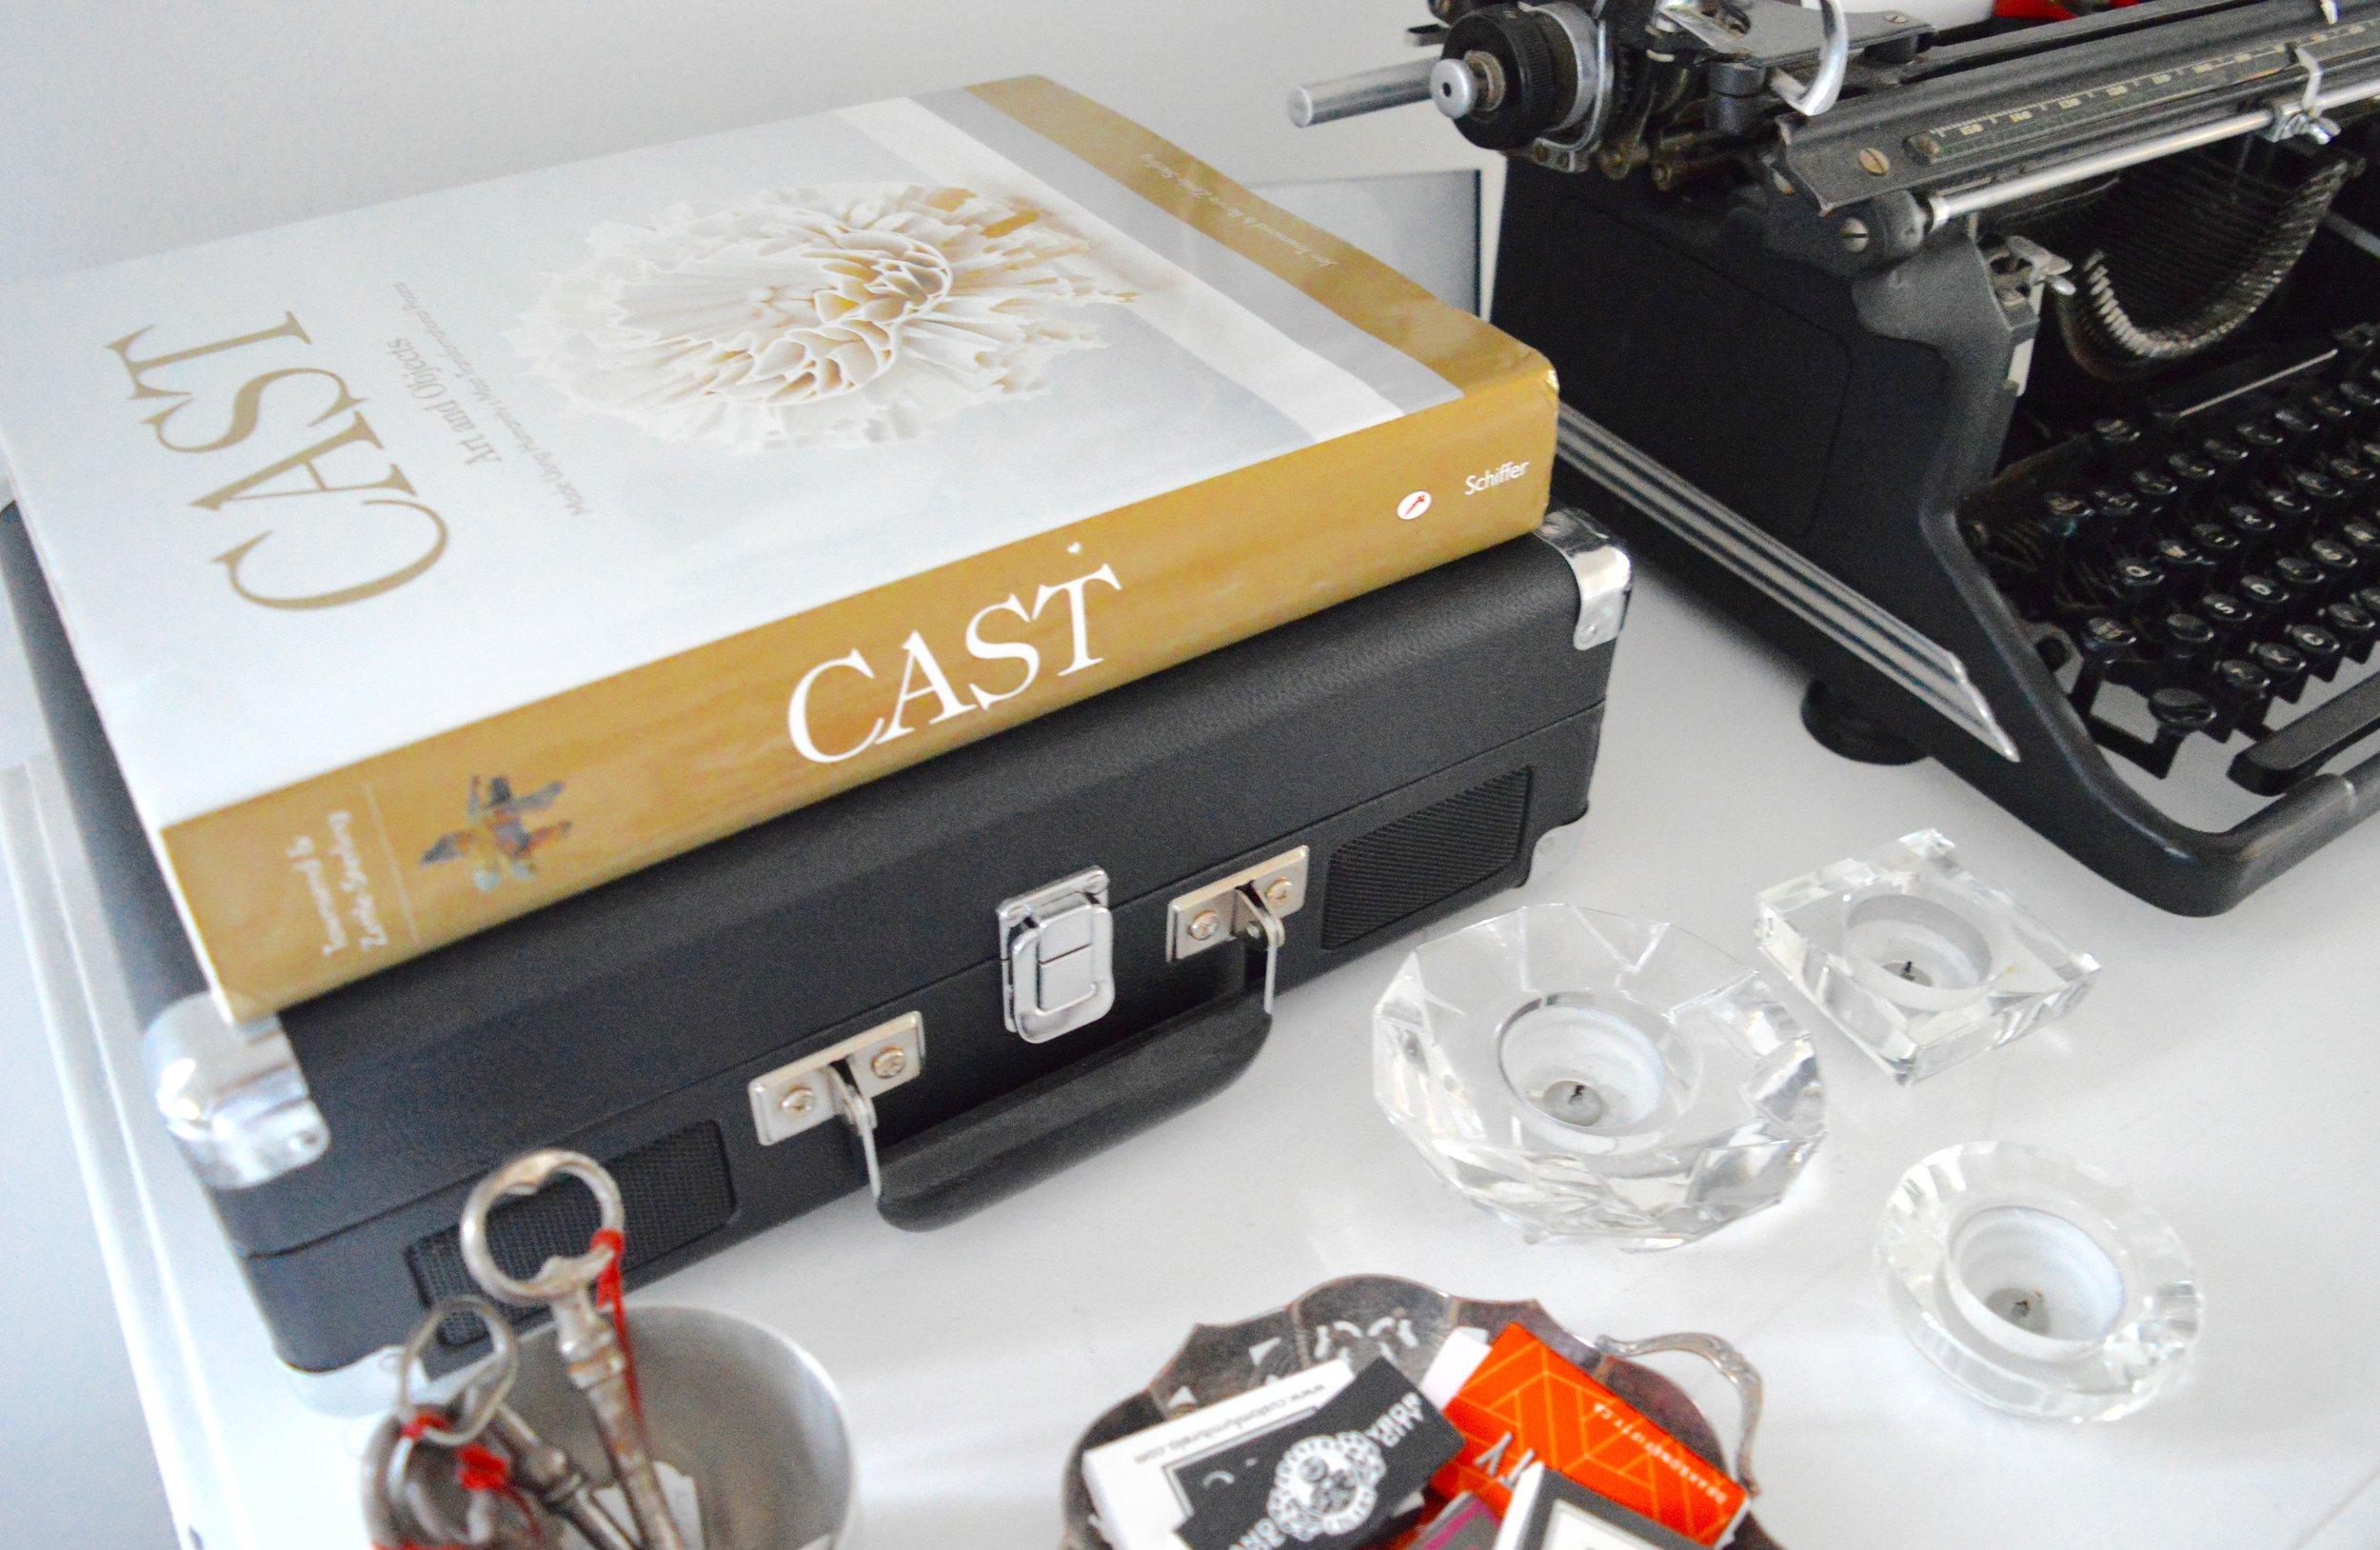 Cast-book-White-Cabana-2-3.jpg